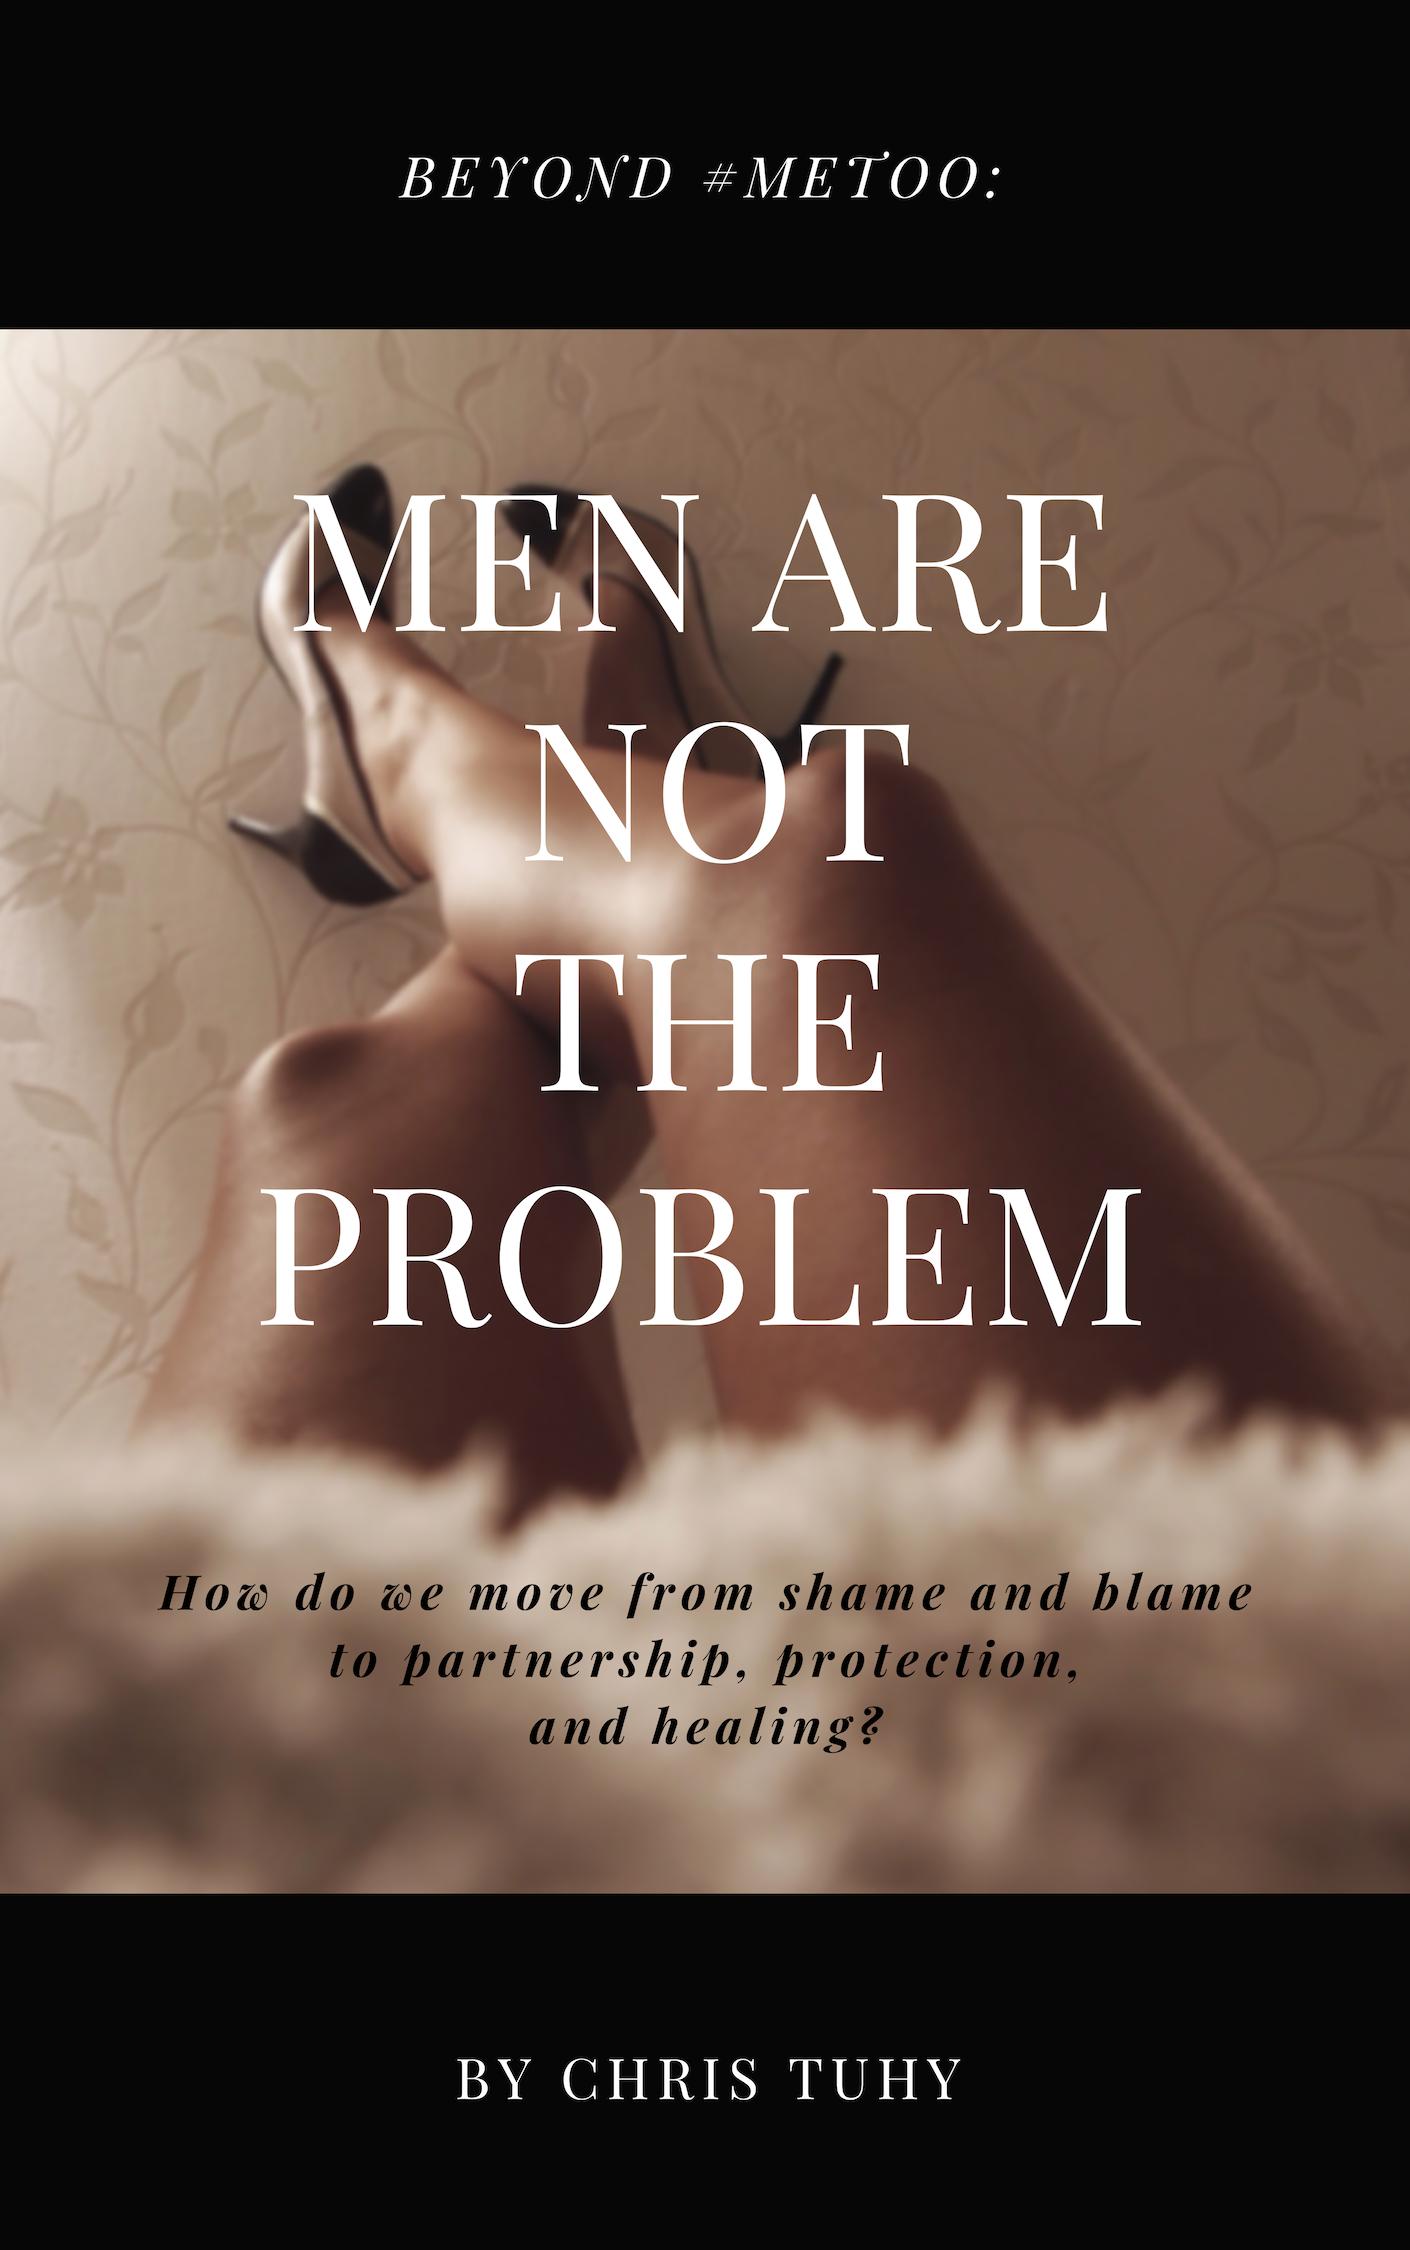 [Original size] men are not the problem.jpg